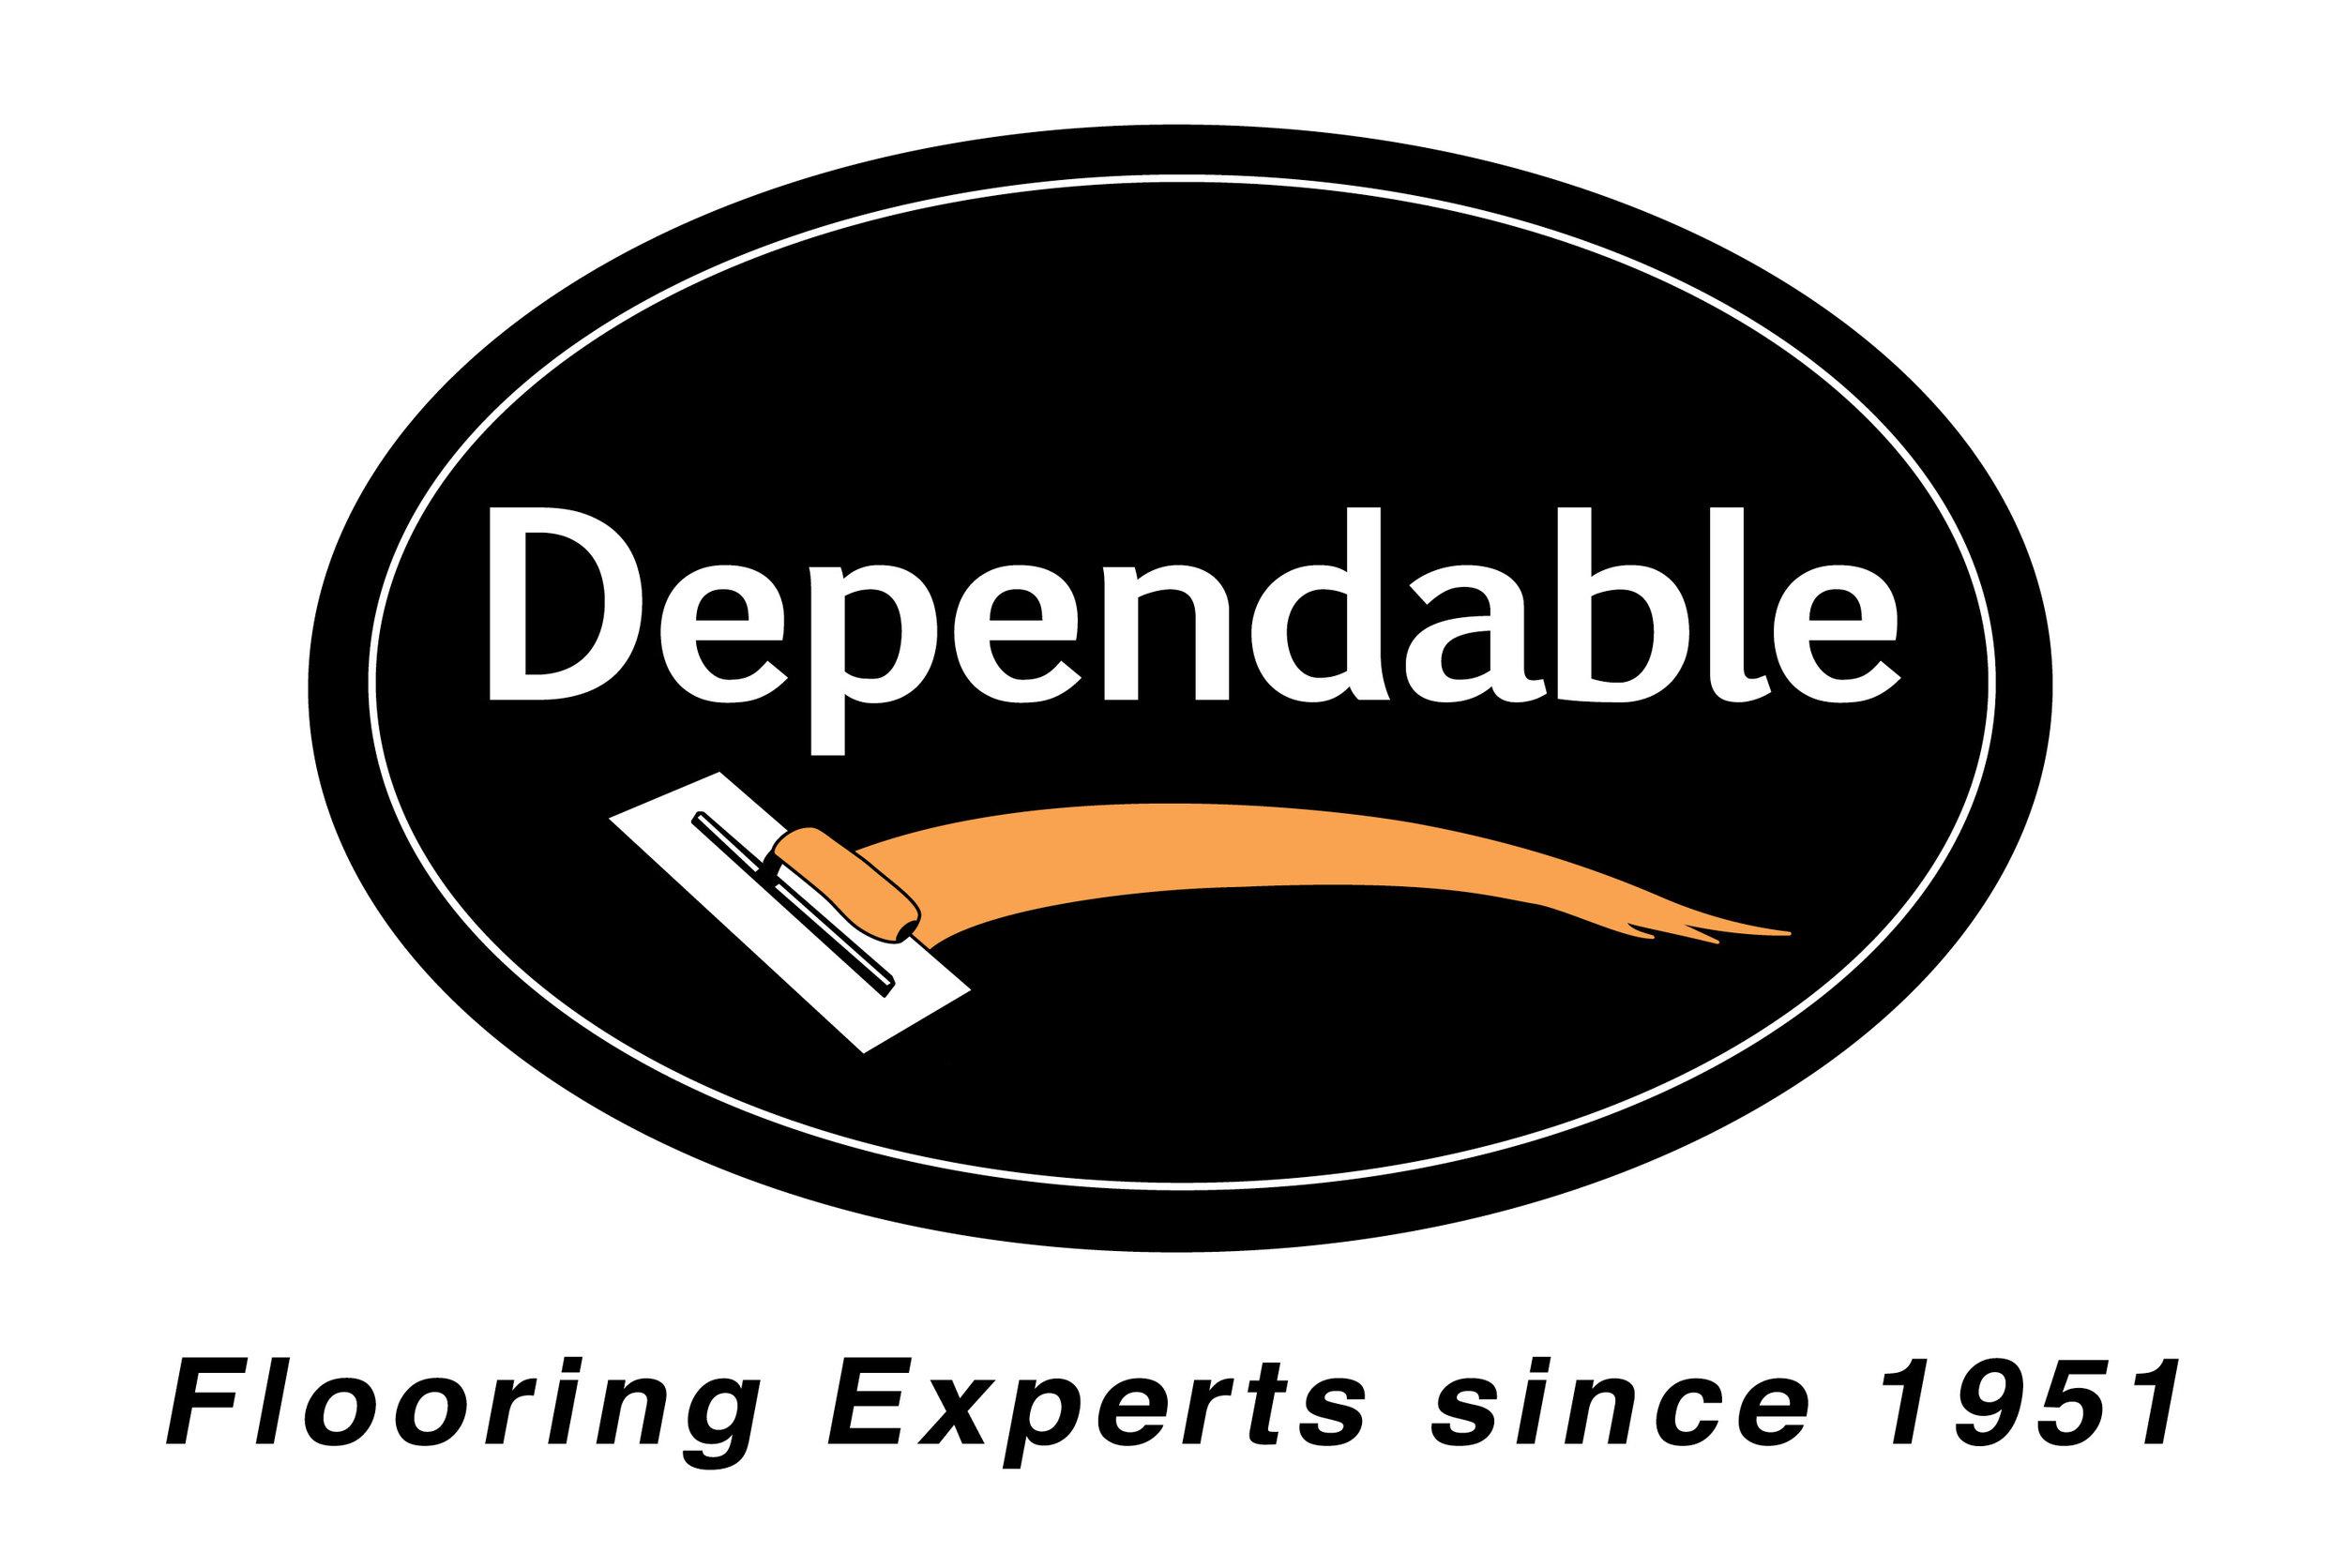 2019 Dependable Logo.jpg